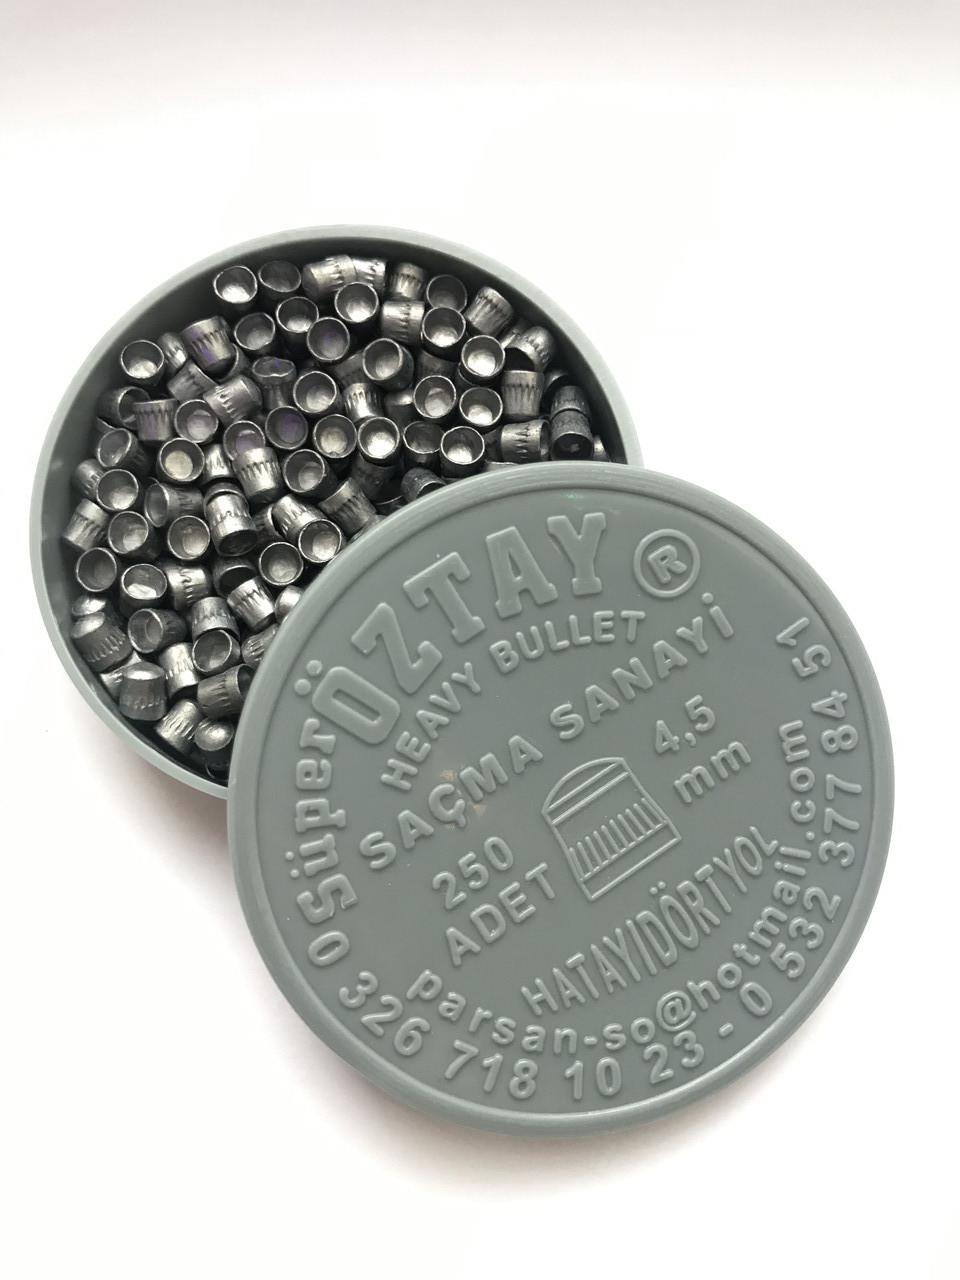 Пули пневматические Super Oztay heavy bullet полусферическая головка  4,5 мм 0,42 г